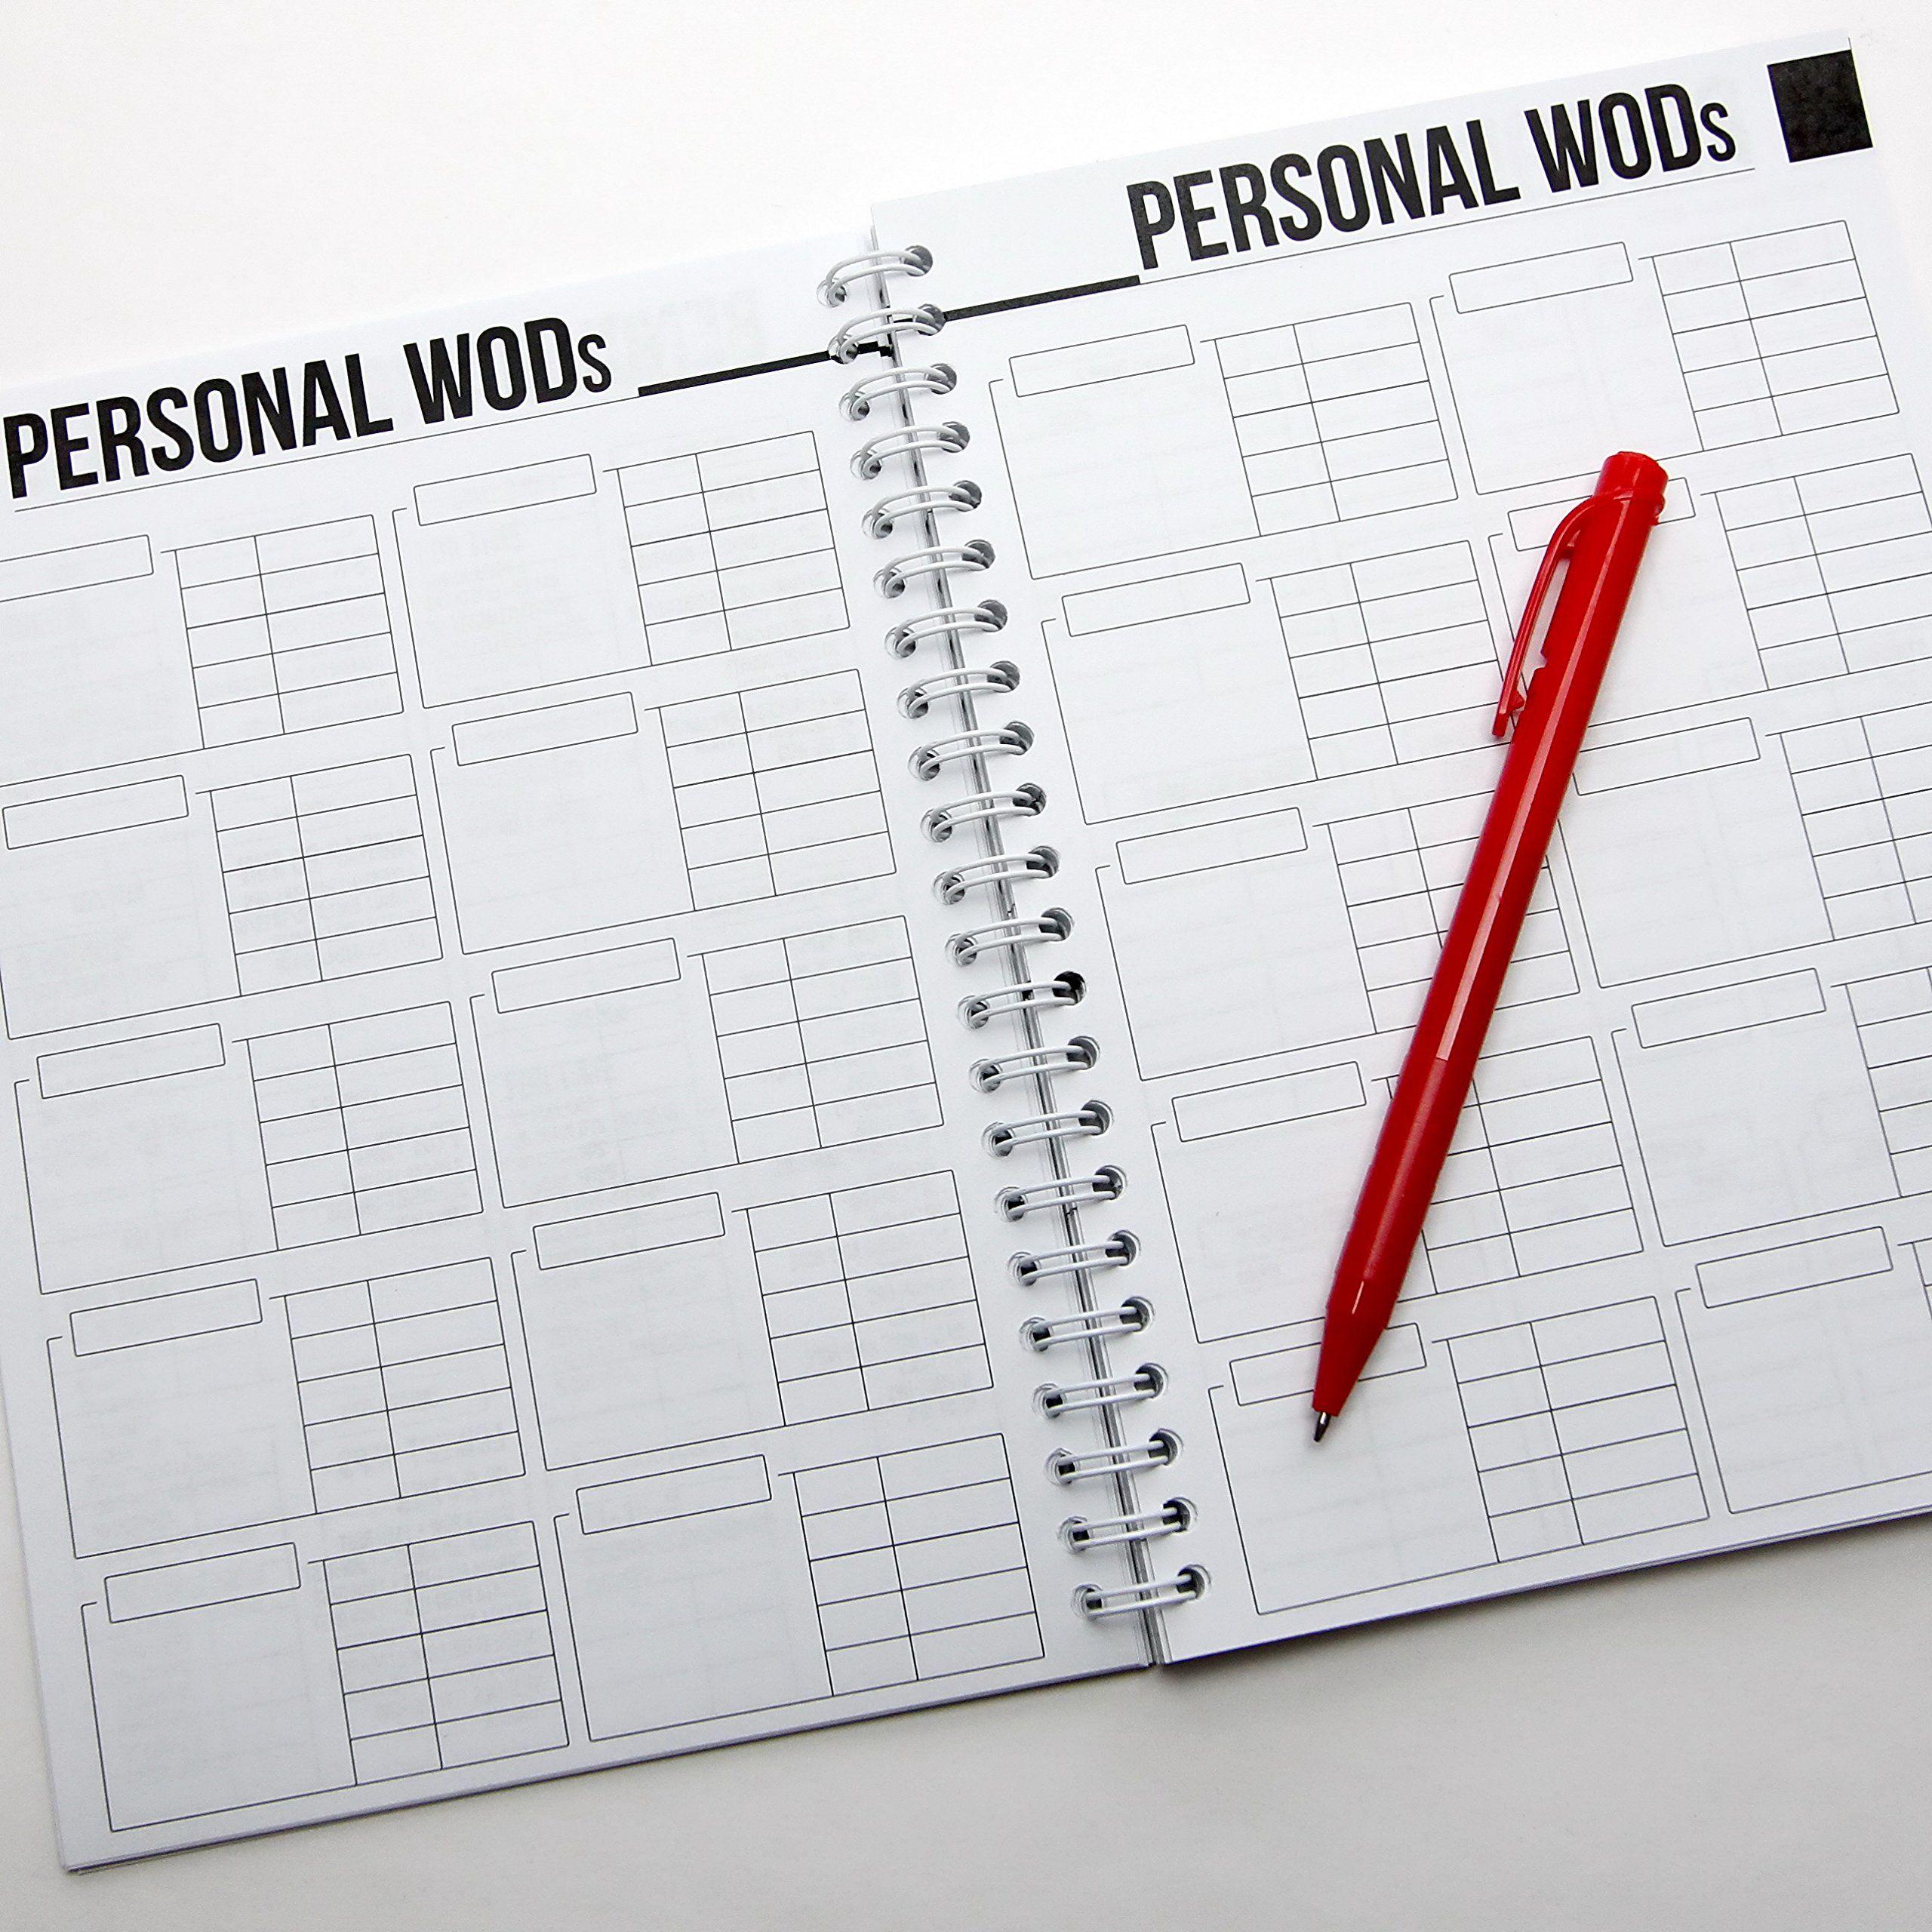 wodbook training journal by profit crossfit wod log book workout